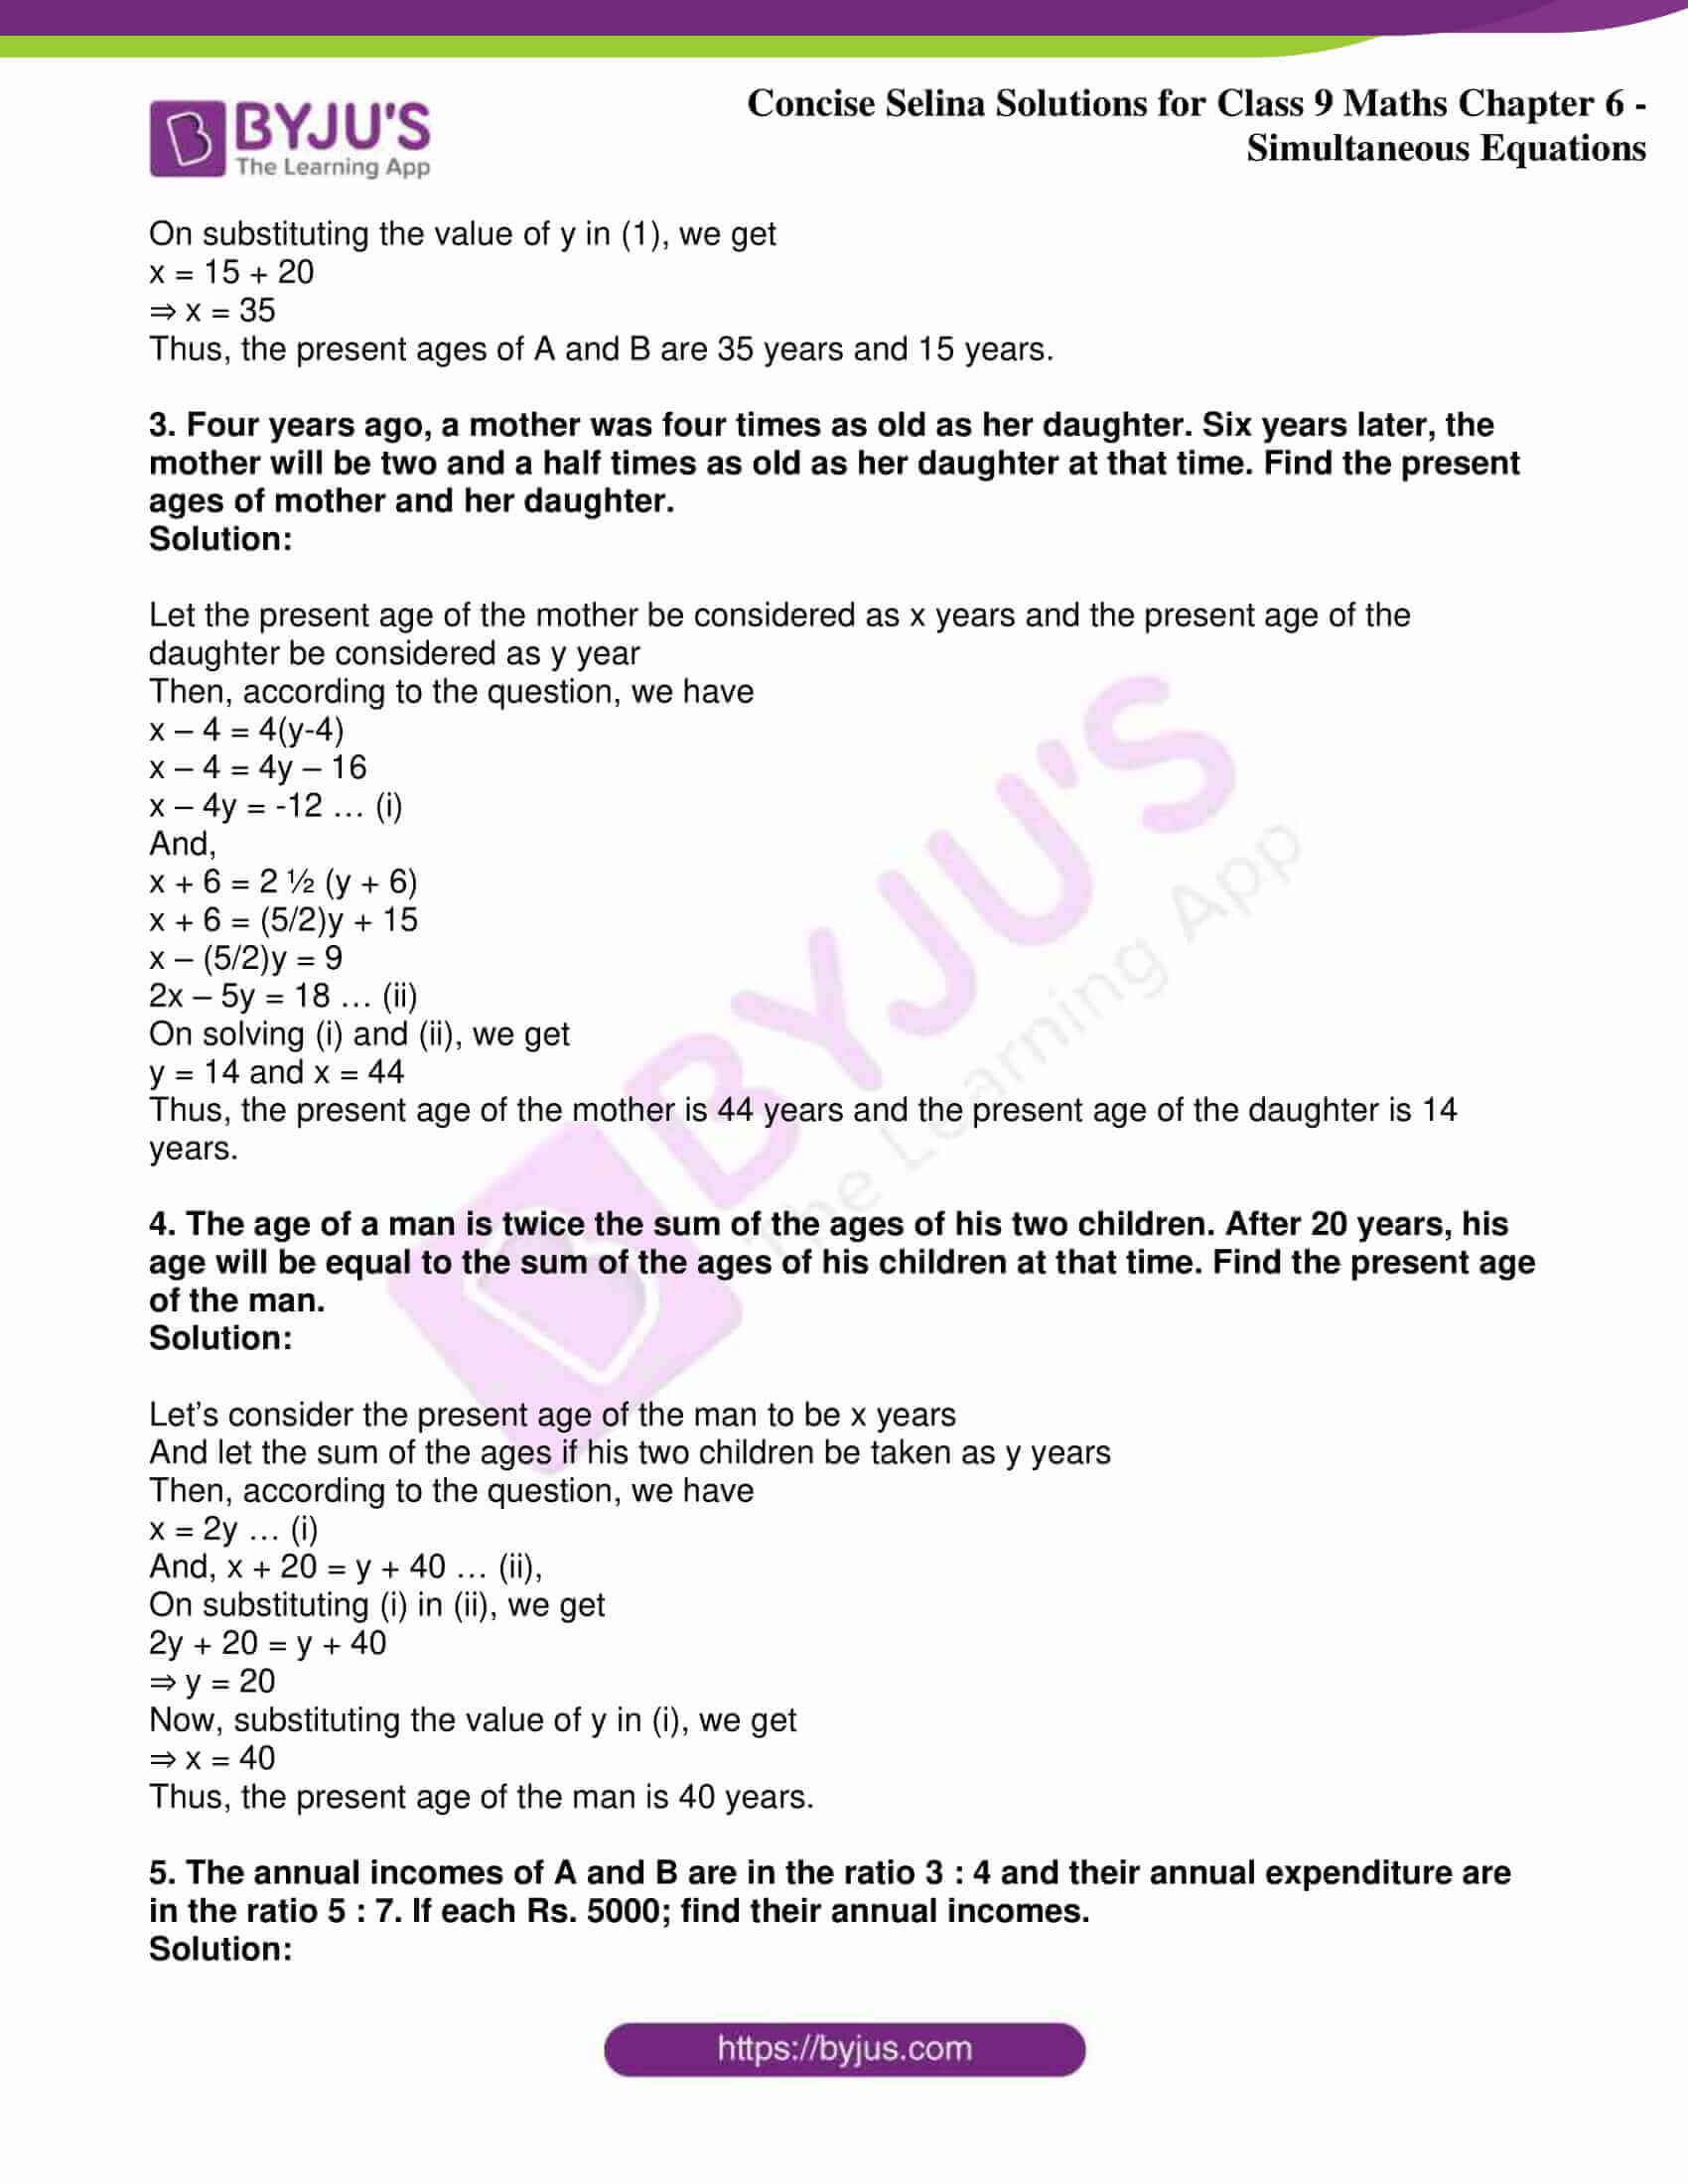 icse class 9 jun7 maths selina solutions chapter 6 simultaneous equations 41